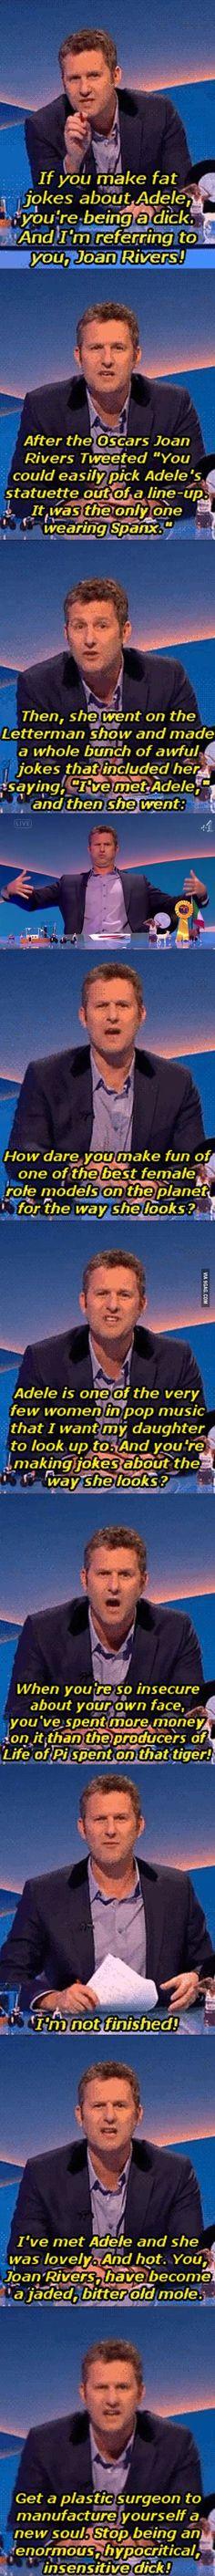 This man deserves an award!